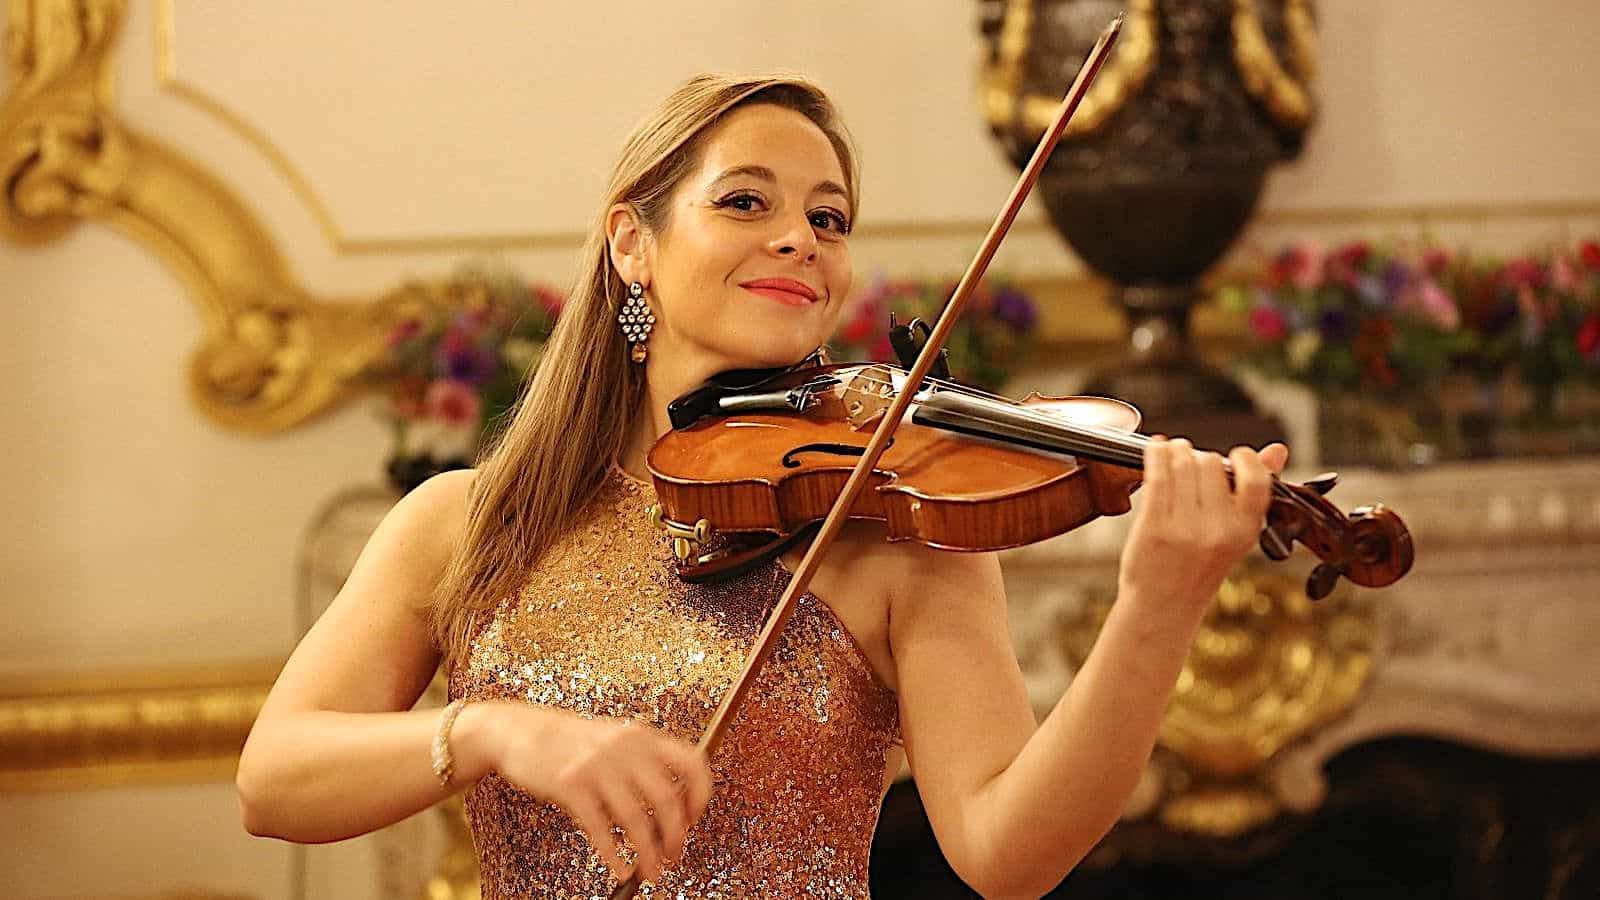 Female Violinist Hire | Female Violinist for Hire | Diane